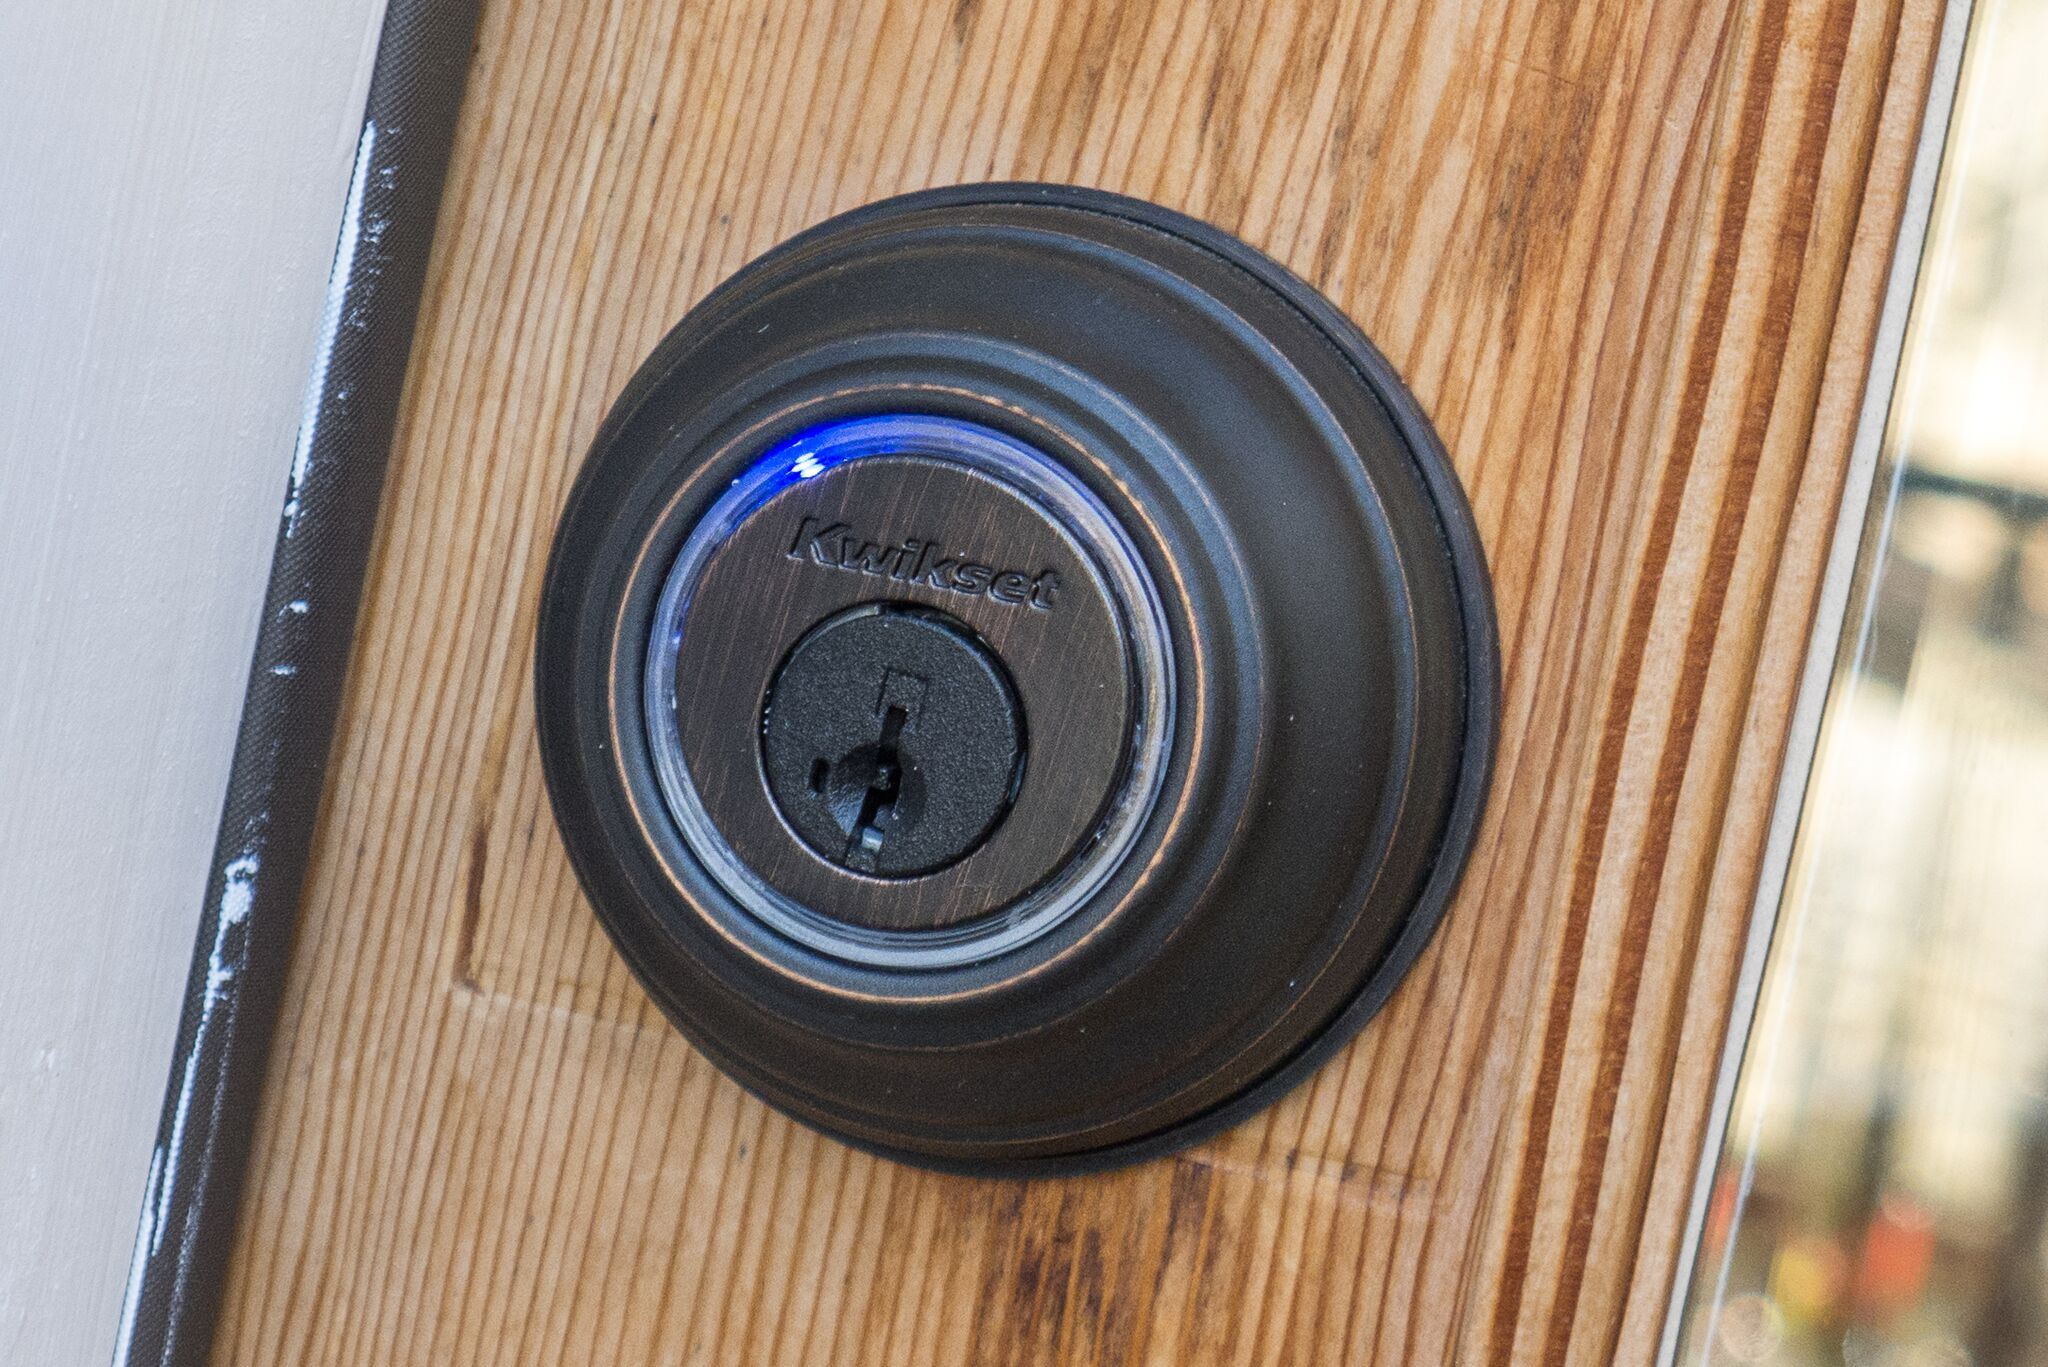 Everyday home gear made smart Kwikset Smart Lock